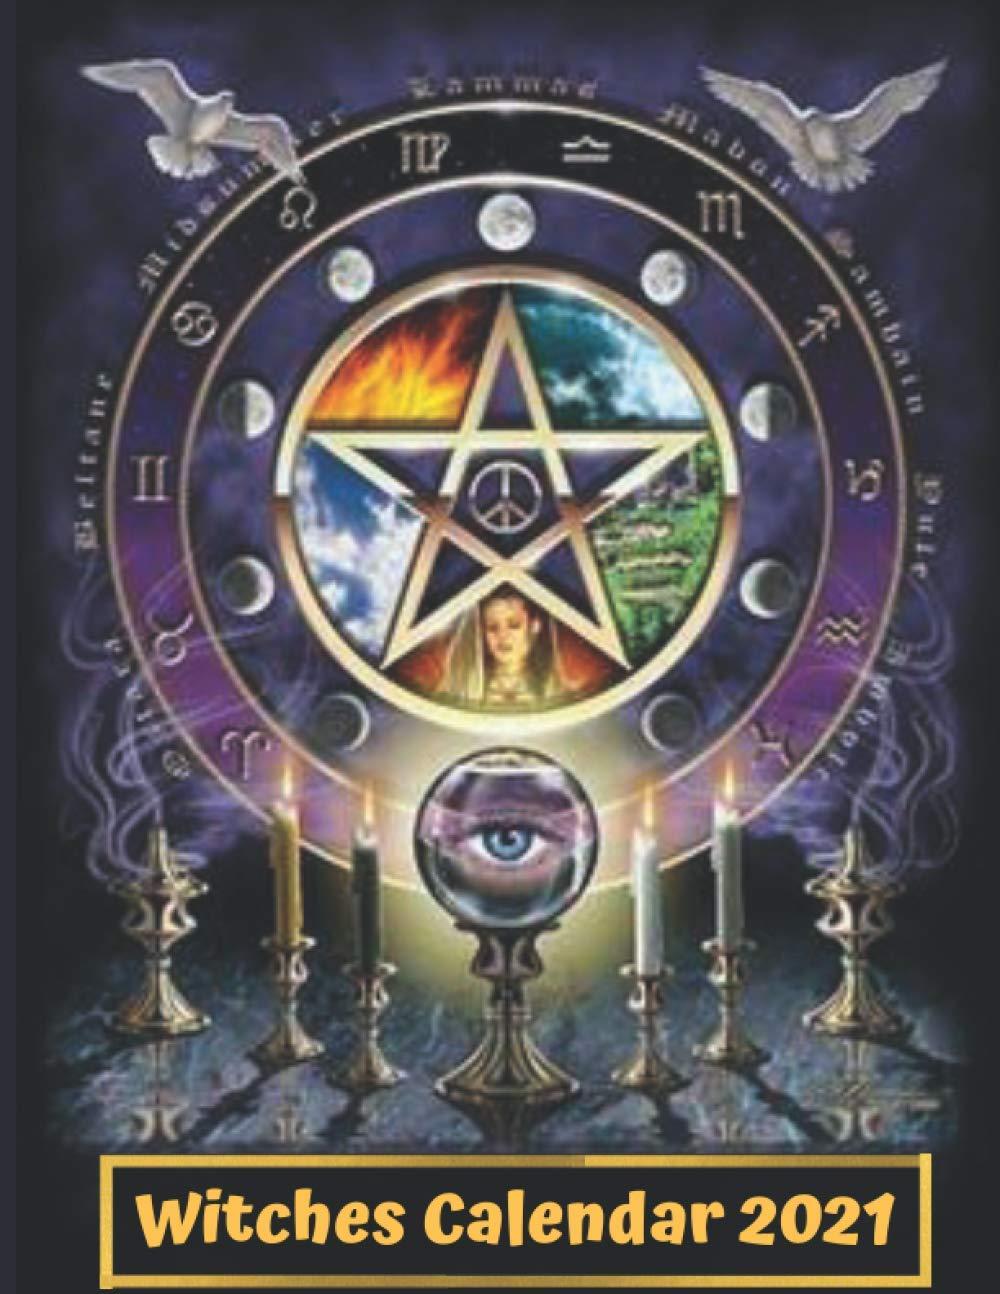 Lunisolar Calendar 2021 Witches Calendar 2021: Lunisolar Calendar and Moon Phases Diary